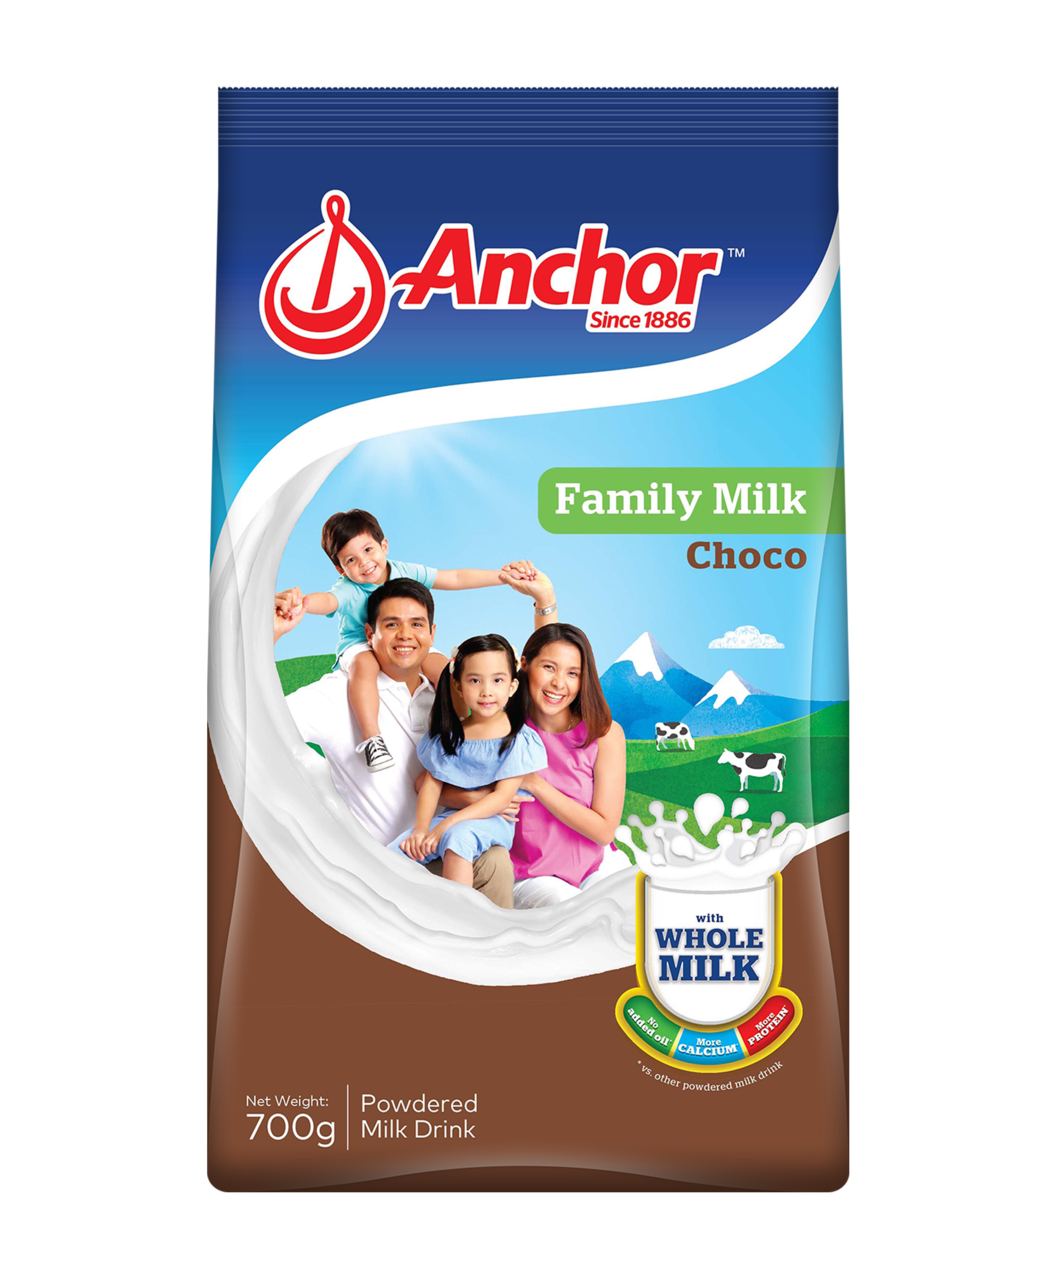 Anchor Family Milk Choco